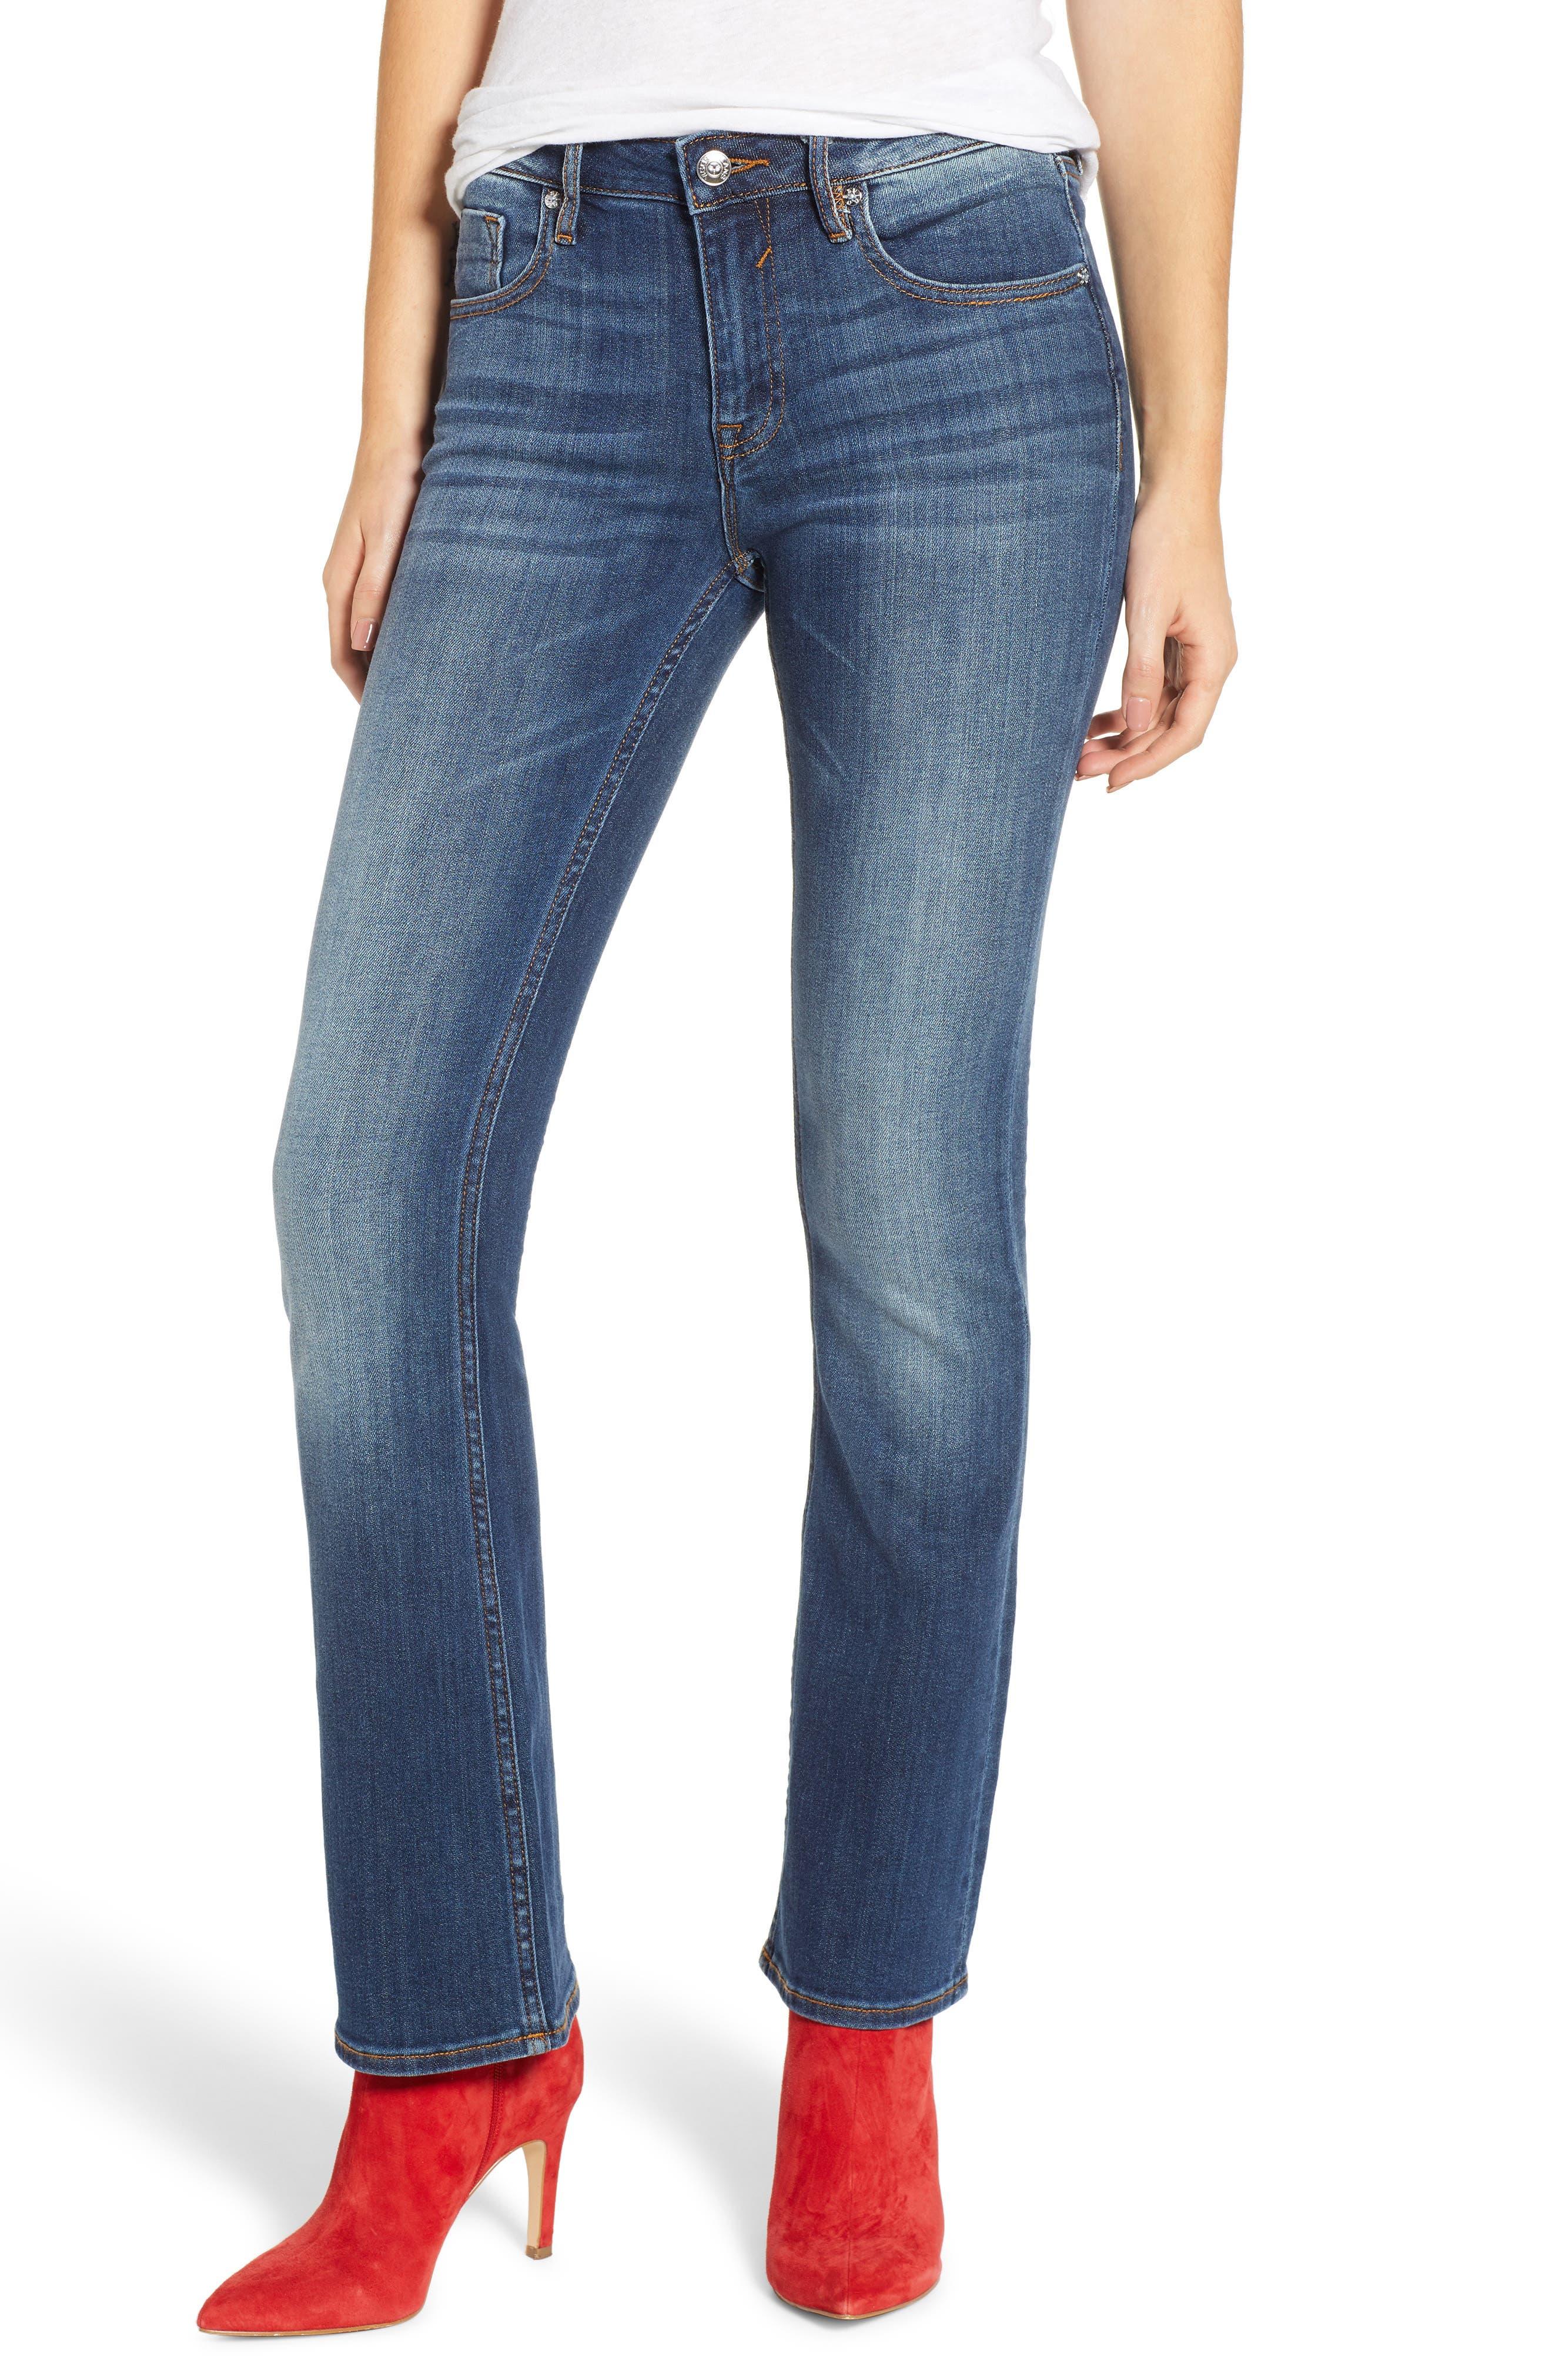 Jagger High Waist Bootcut Jeans,                         Main,                         color, DARK WASH